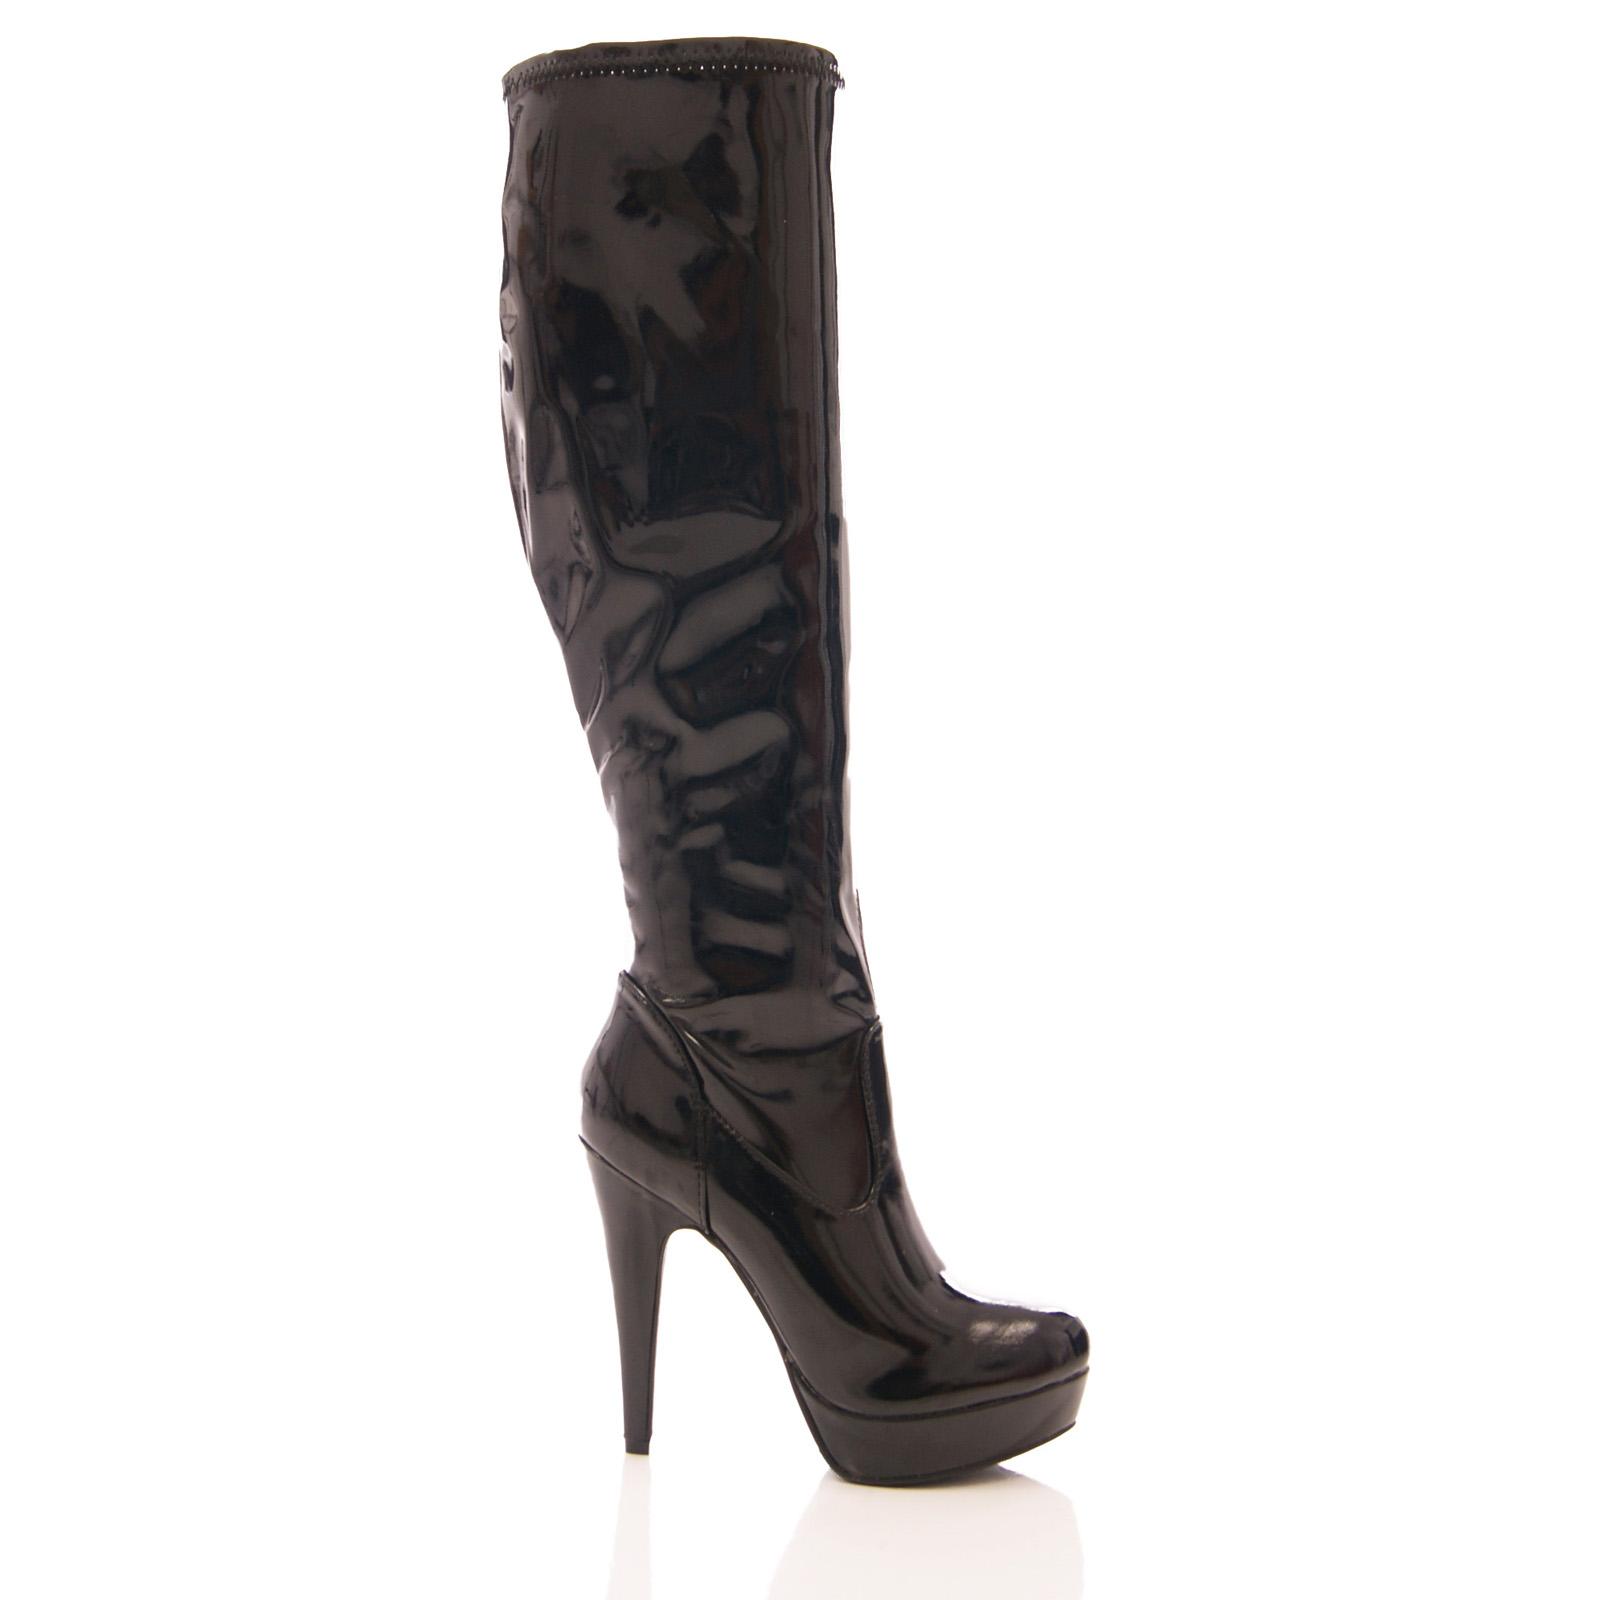 femme stretch bottes platorm talon haut sexy longue jambe aiguille chaussures taille. Black Bedroom Furniture Sets. Home Design Ideas